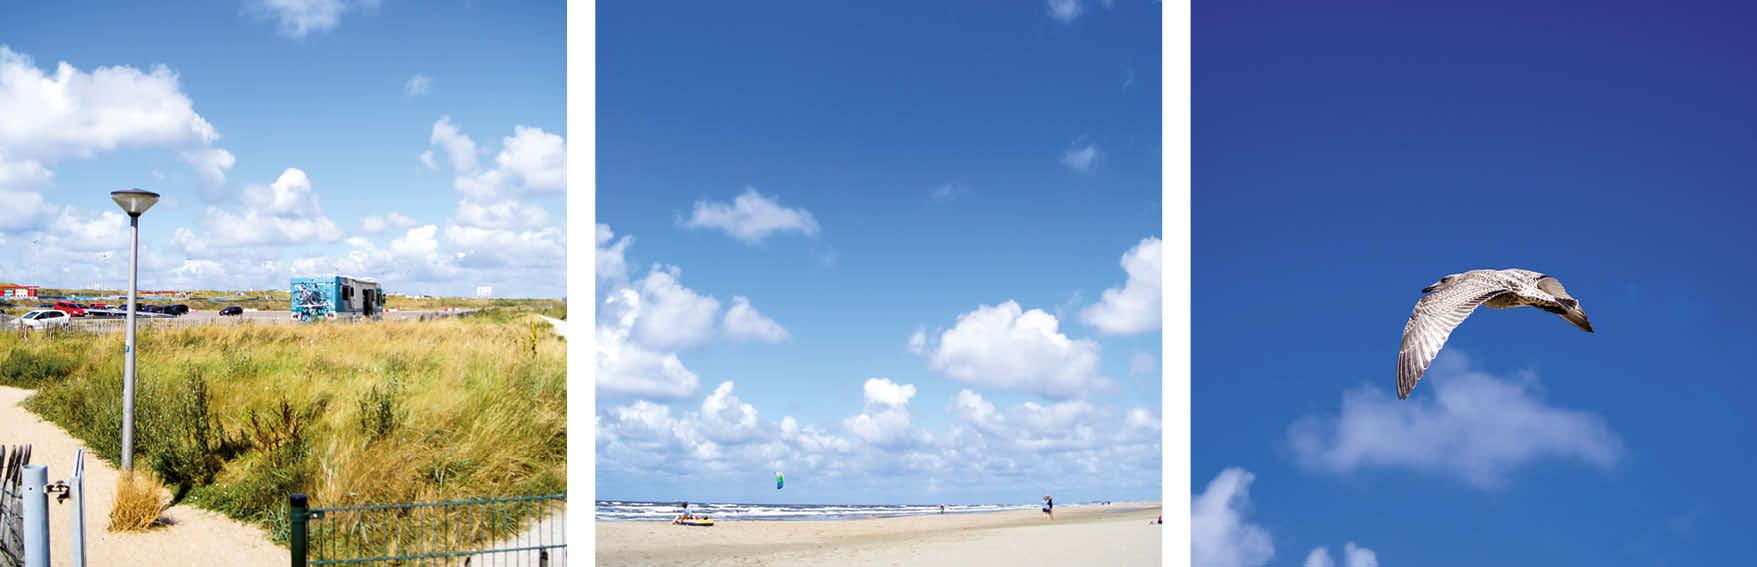 Zandvoort aan Zee – Anna Born, Serien-Nr.: 361-012